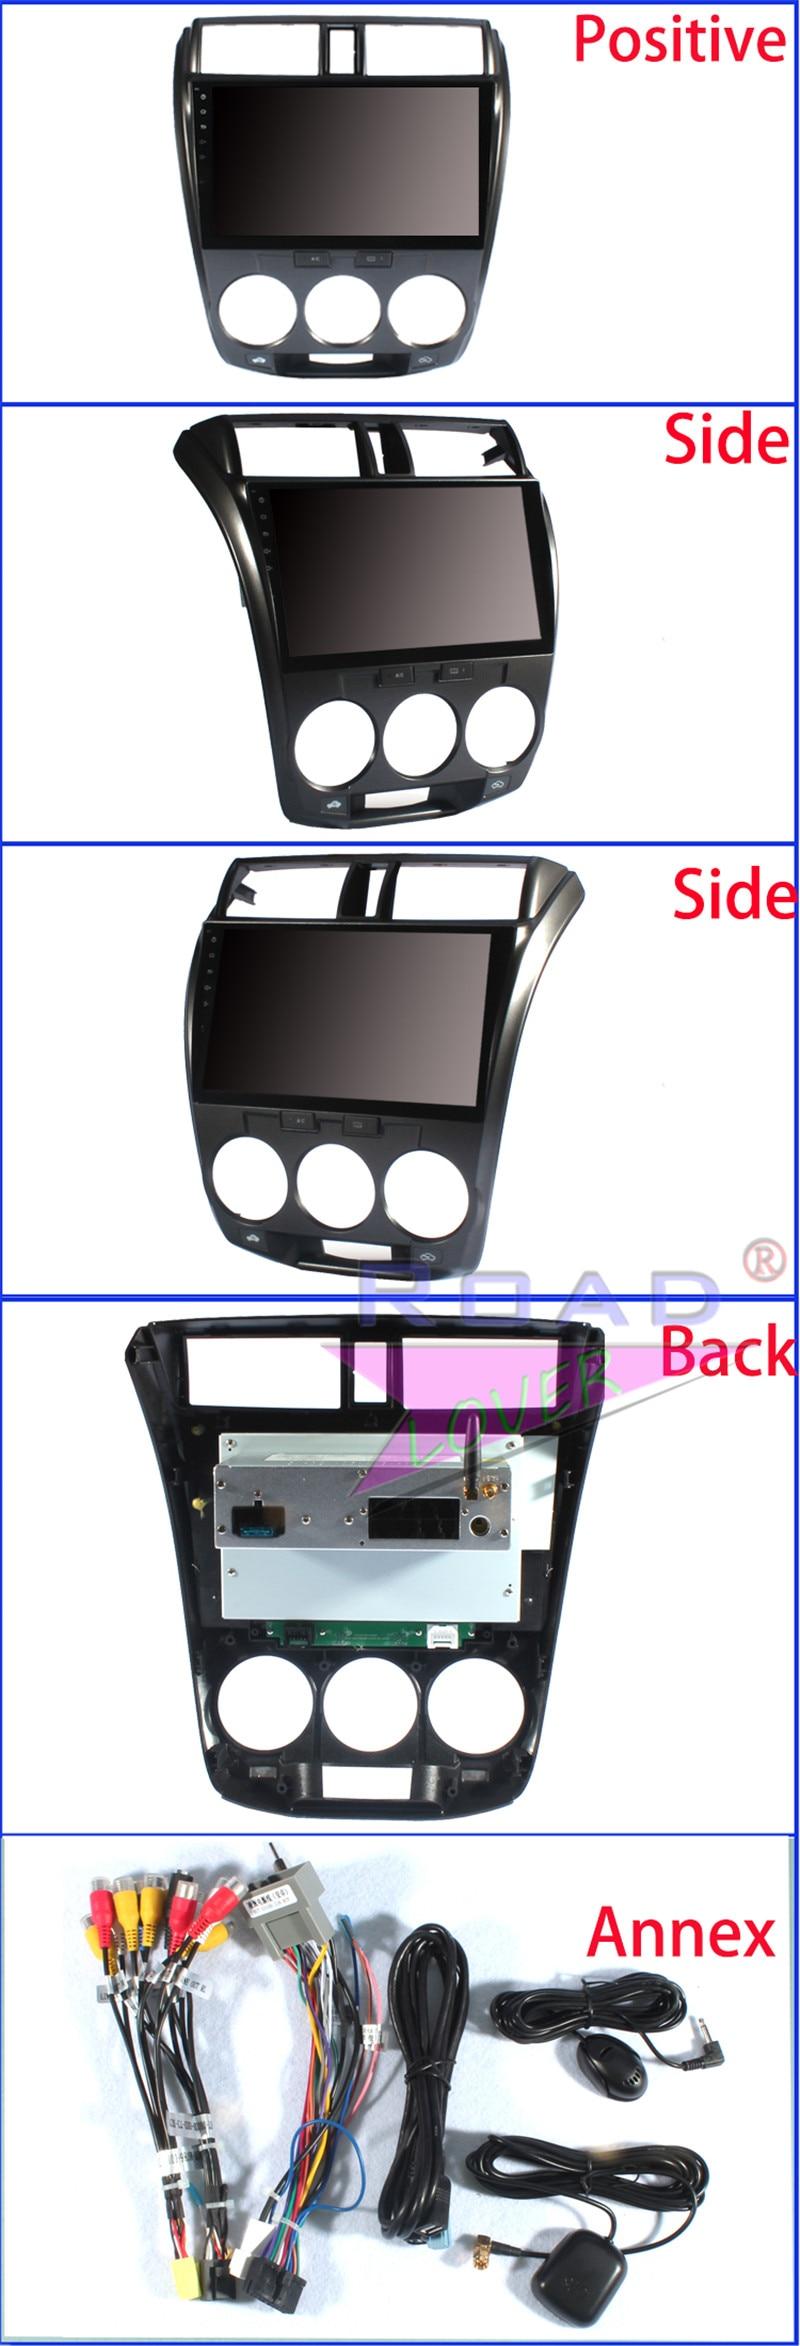 magnitol 2 din For Honda City 2012